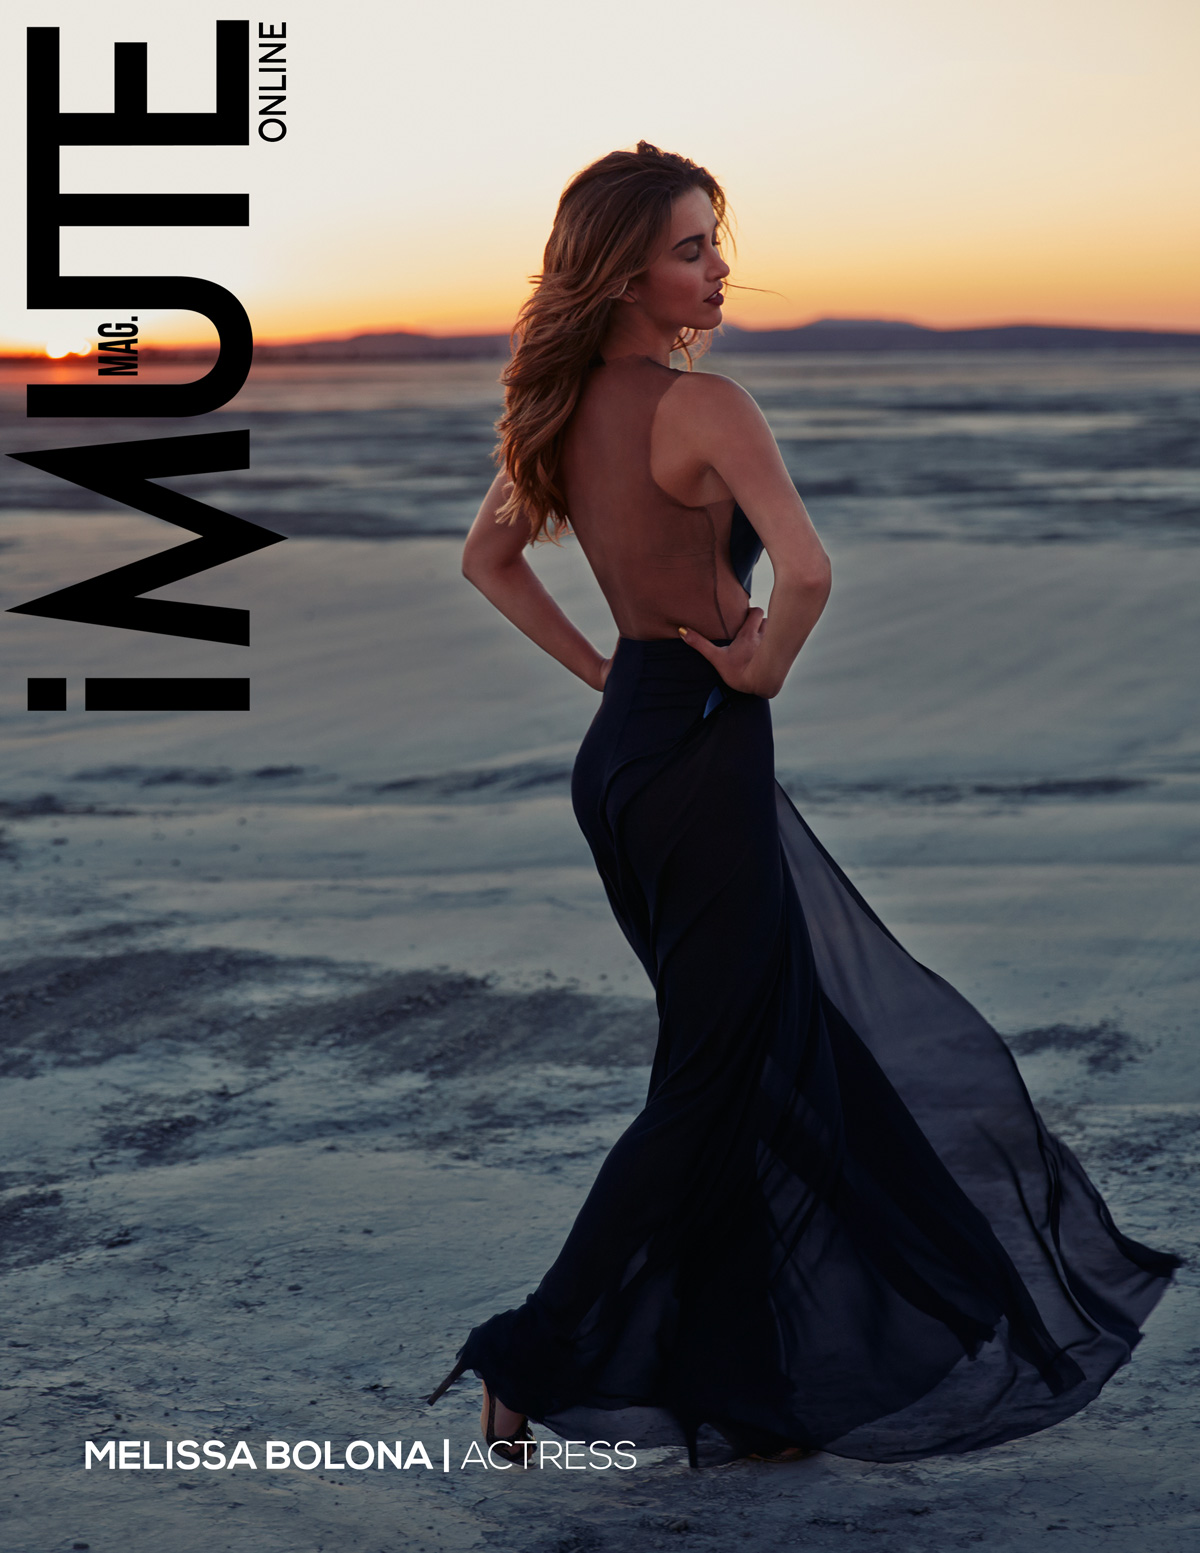 Melissa webitorial for iMute Magazine Photographer / John Russo Model & Actress / Melissa Boloña Stylist / Marissa Peden Make up / Karolina Kangas Hair / Guy Romeo Manicurist / Noon Bui